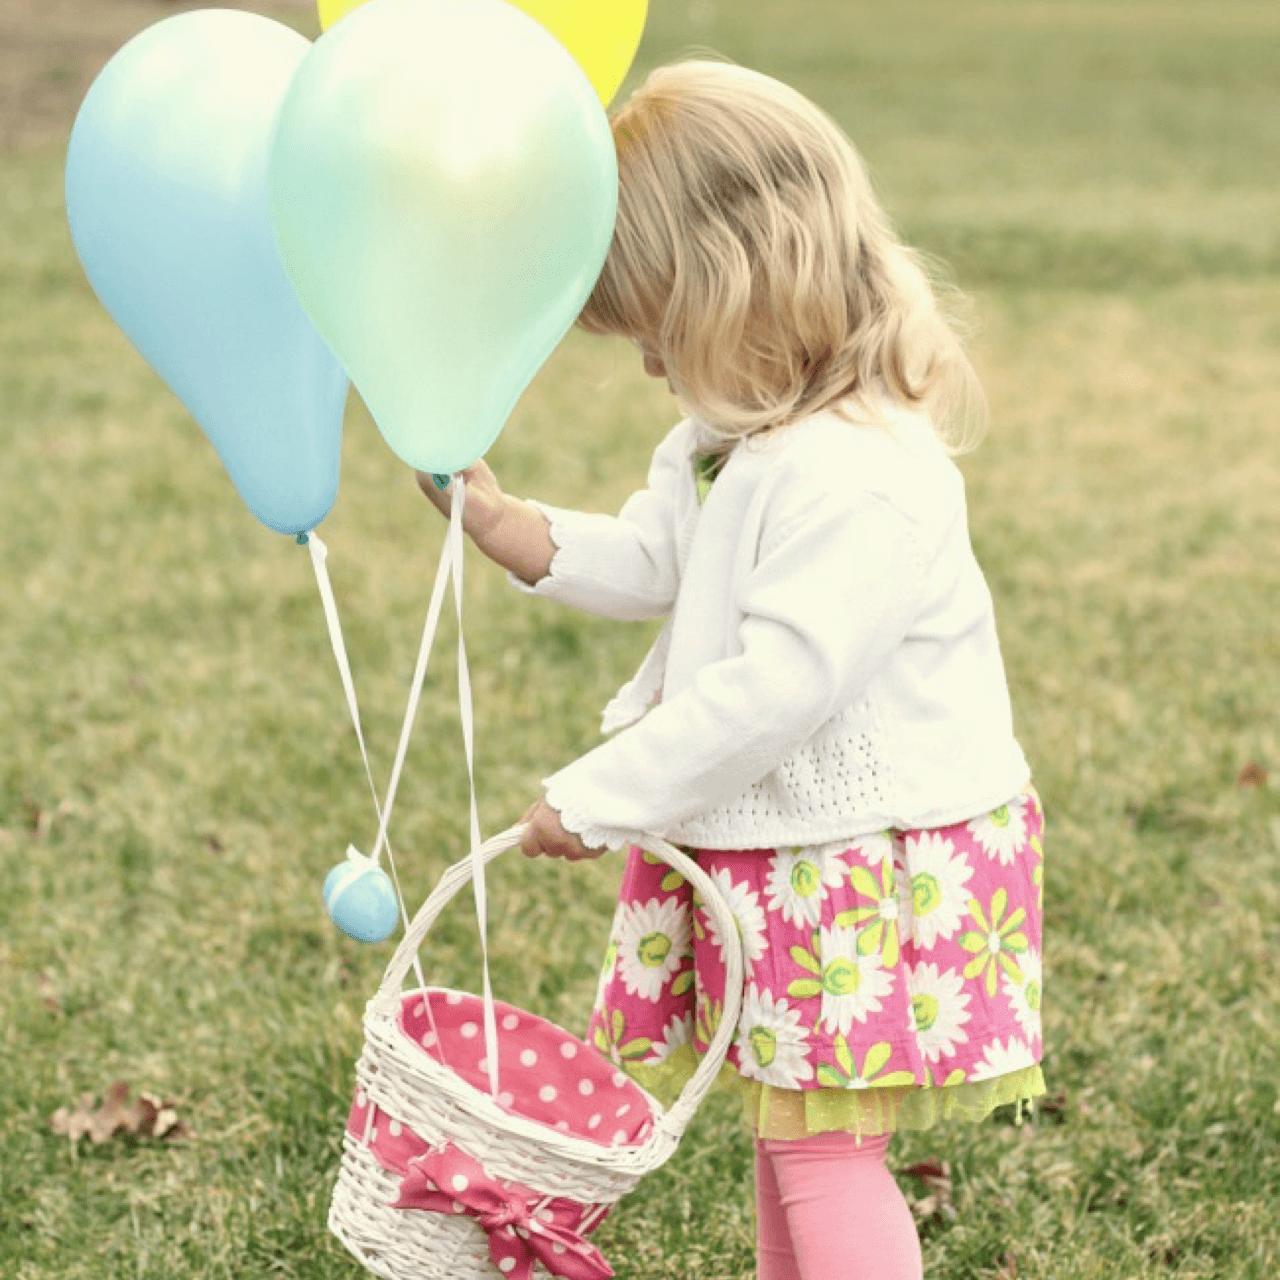 Unforgettable Easter Egg Hunt Ideas balloons Image